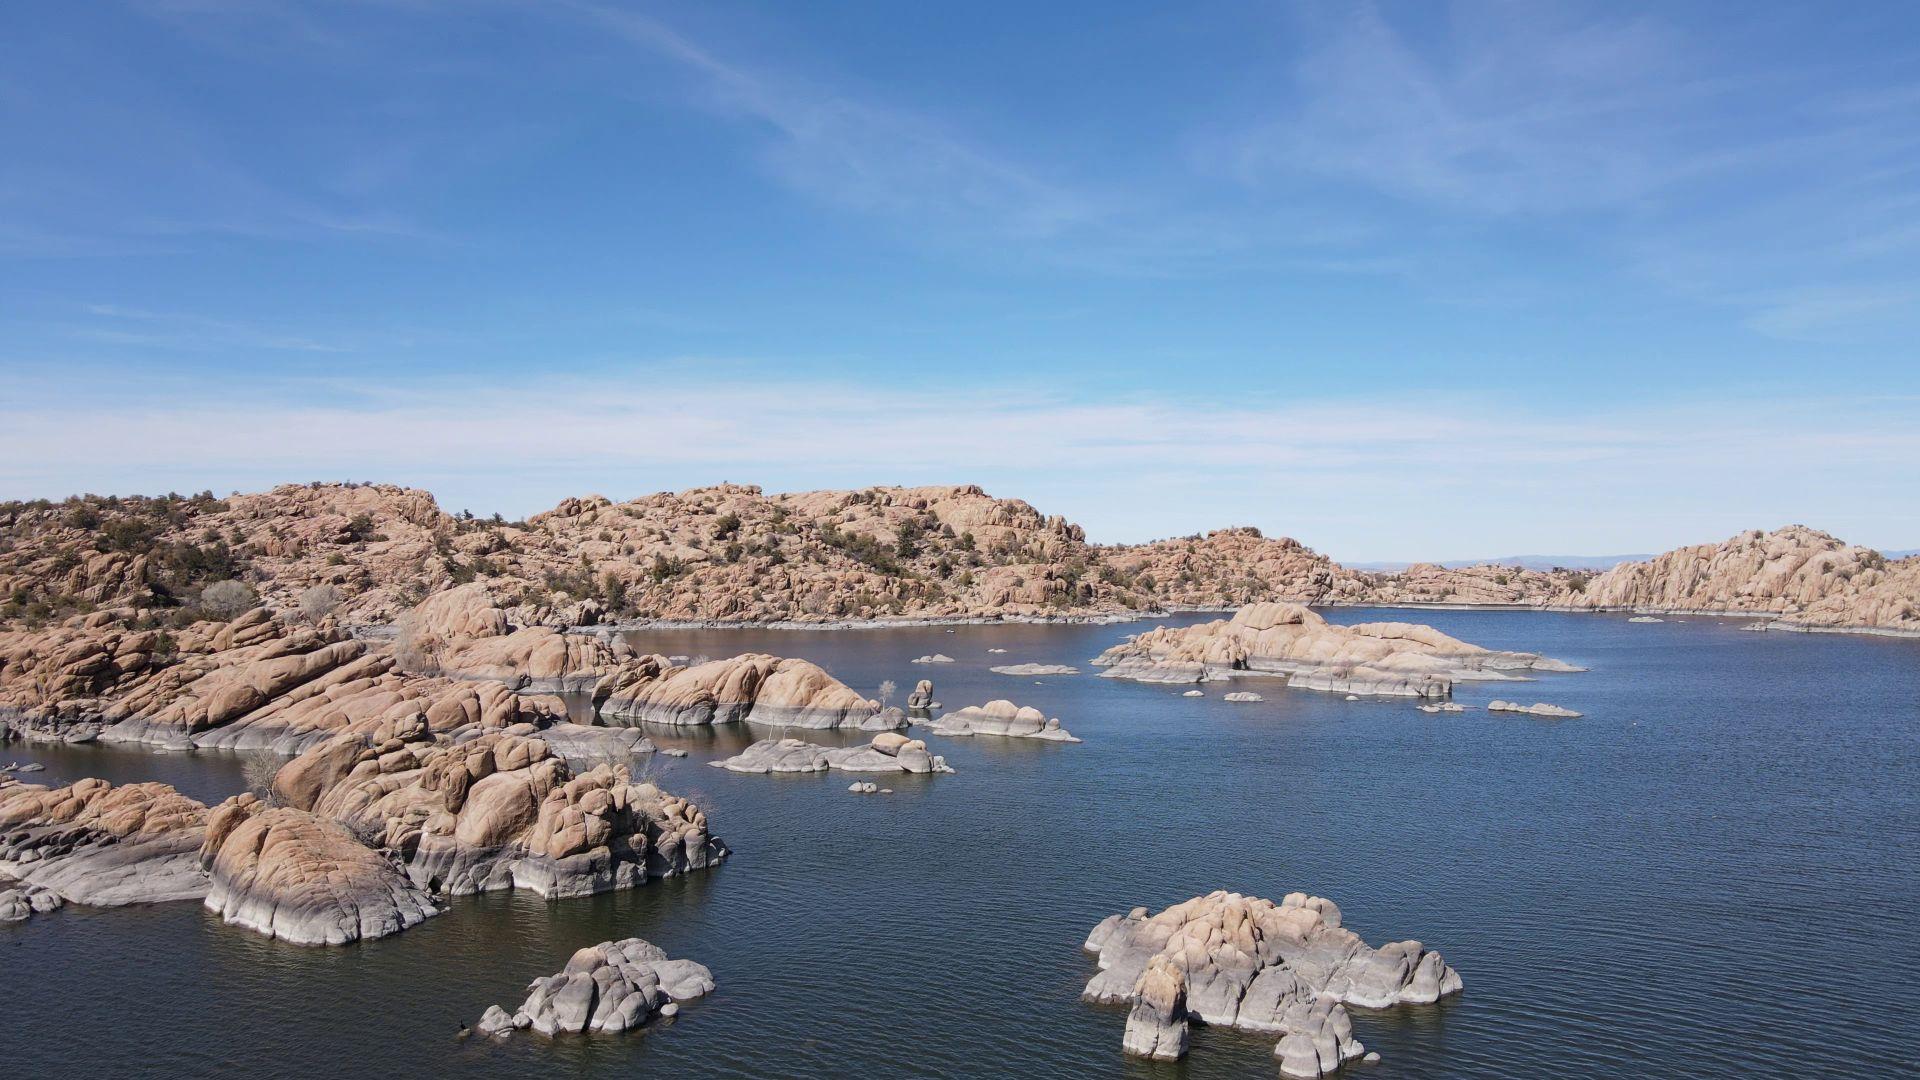 Scenery of Granite Dells with lake